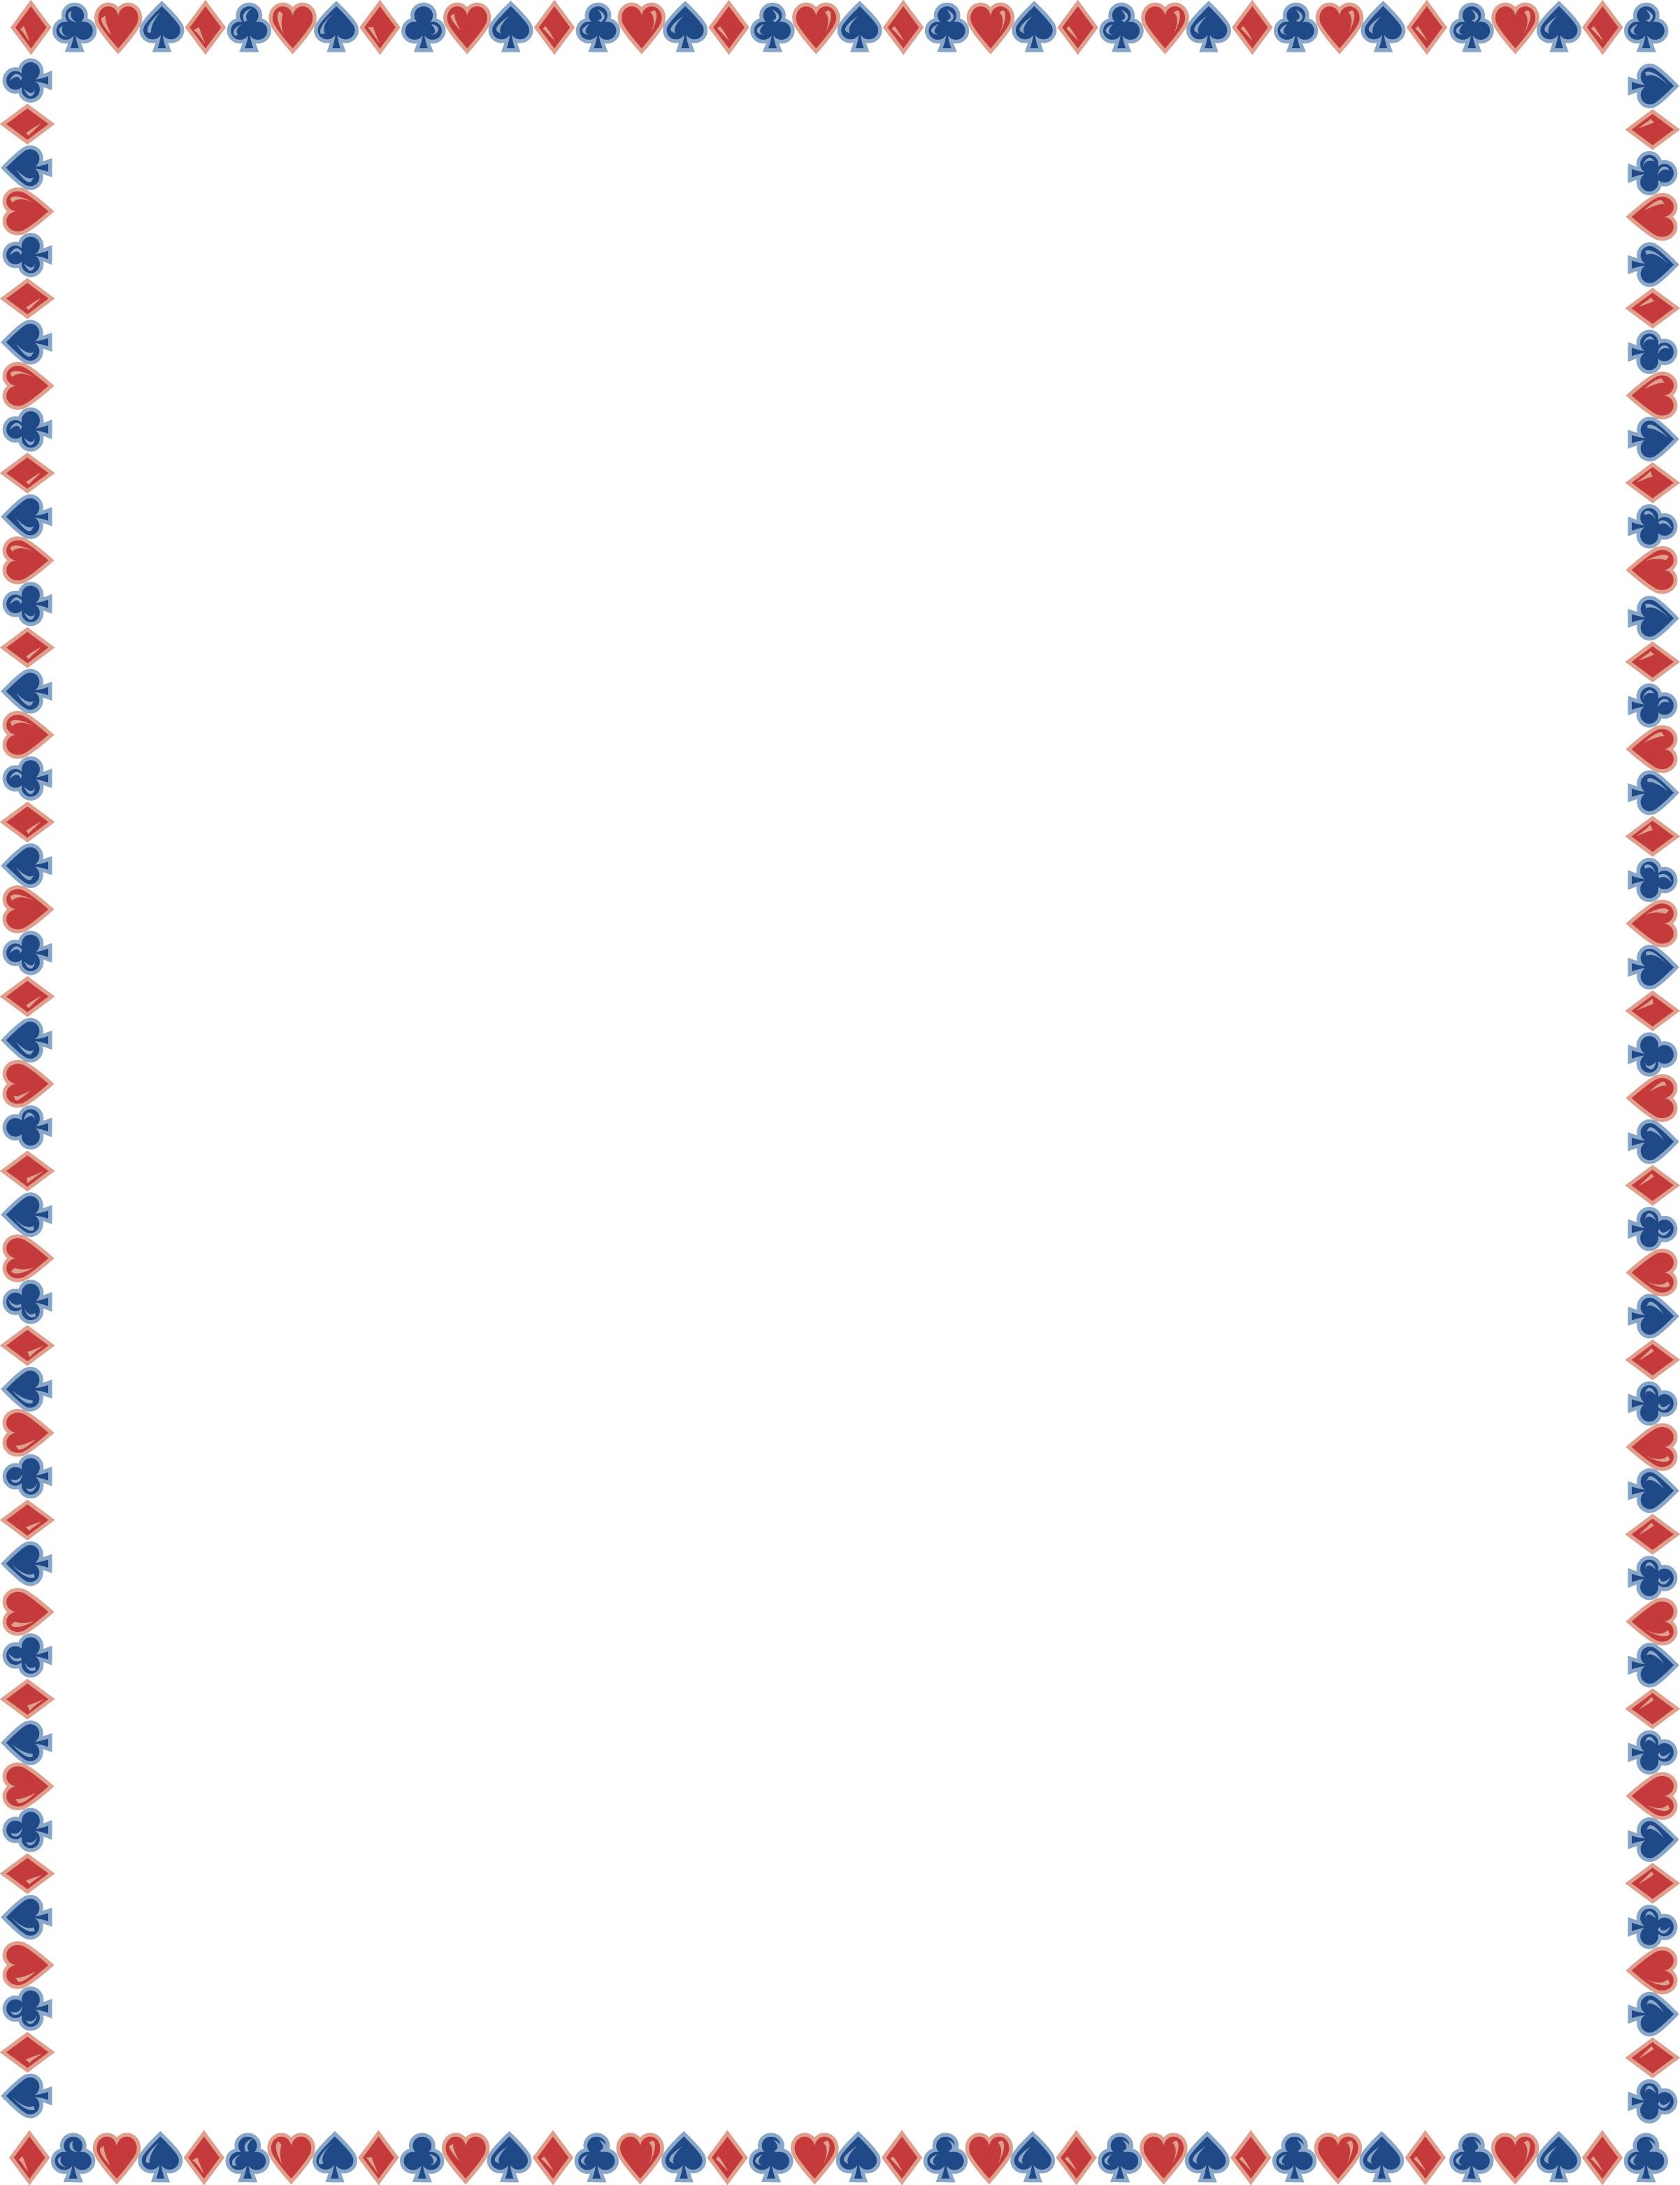 Free BBQ Border Cliparts, Download Free Clip Art, Free Clip Art on.